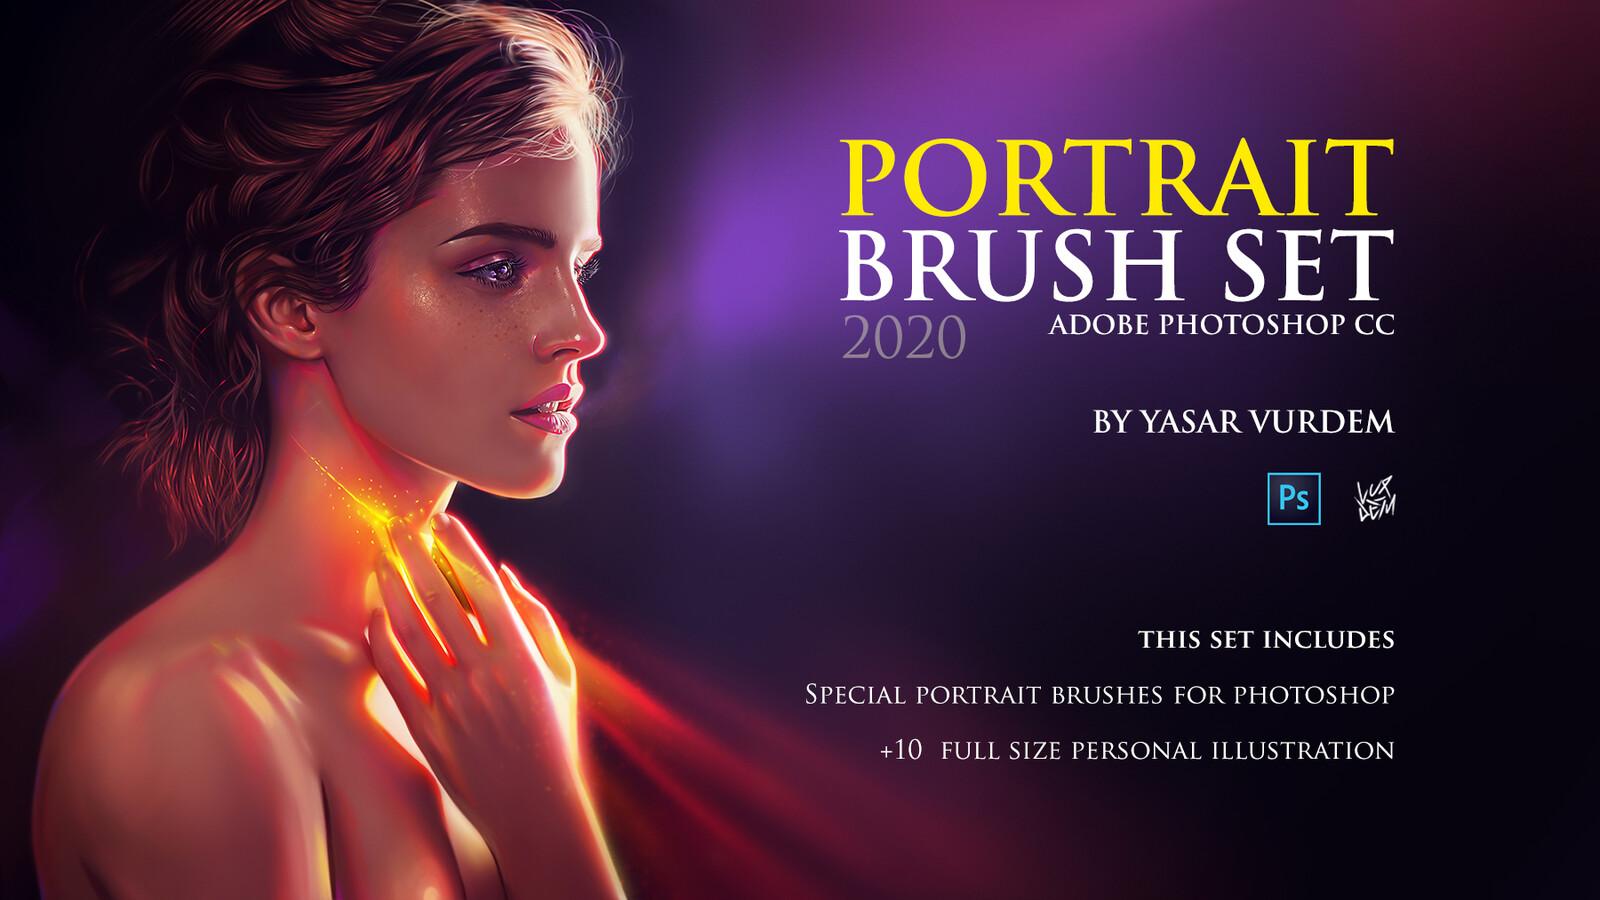 A Set of special brushes in categories includes, sketch, hard, soft, skin, freckles, hair, eye brushes  Download Link: https://www.artstation.com/vurdem/store/YxPB/portrait-brush-set-for-photoshop